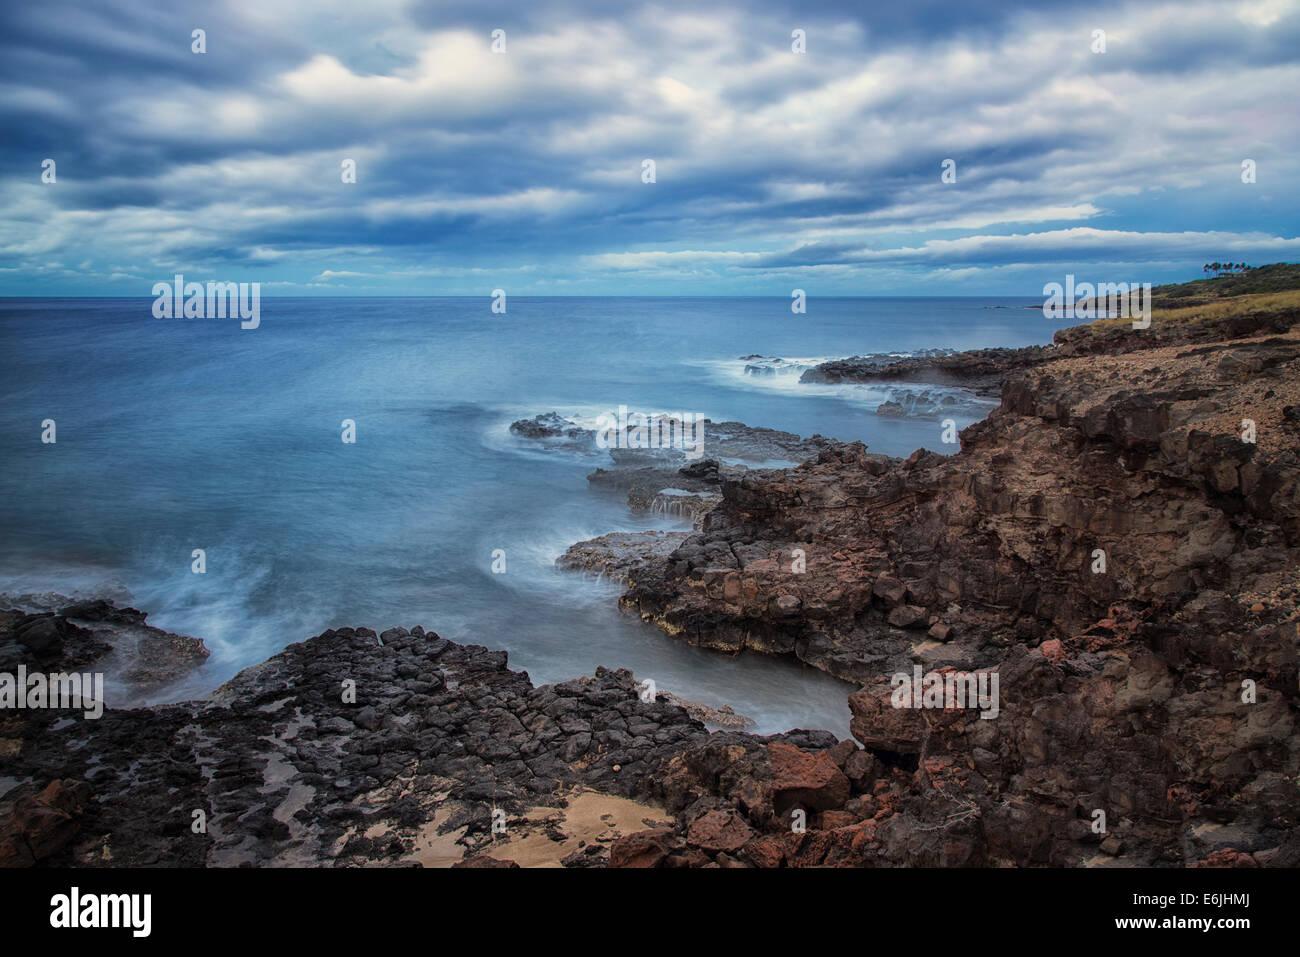 Coastline in Lanai, Hawaii - Stock Image